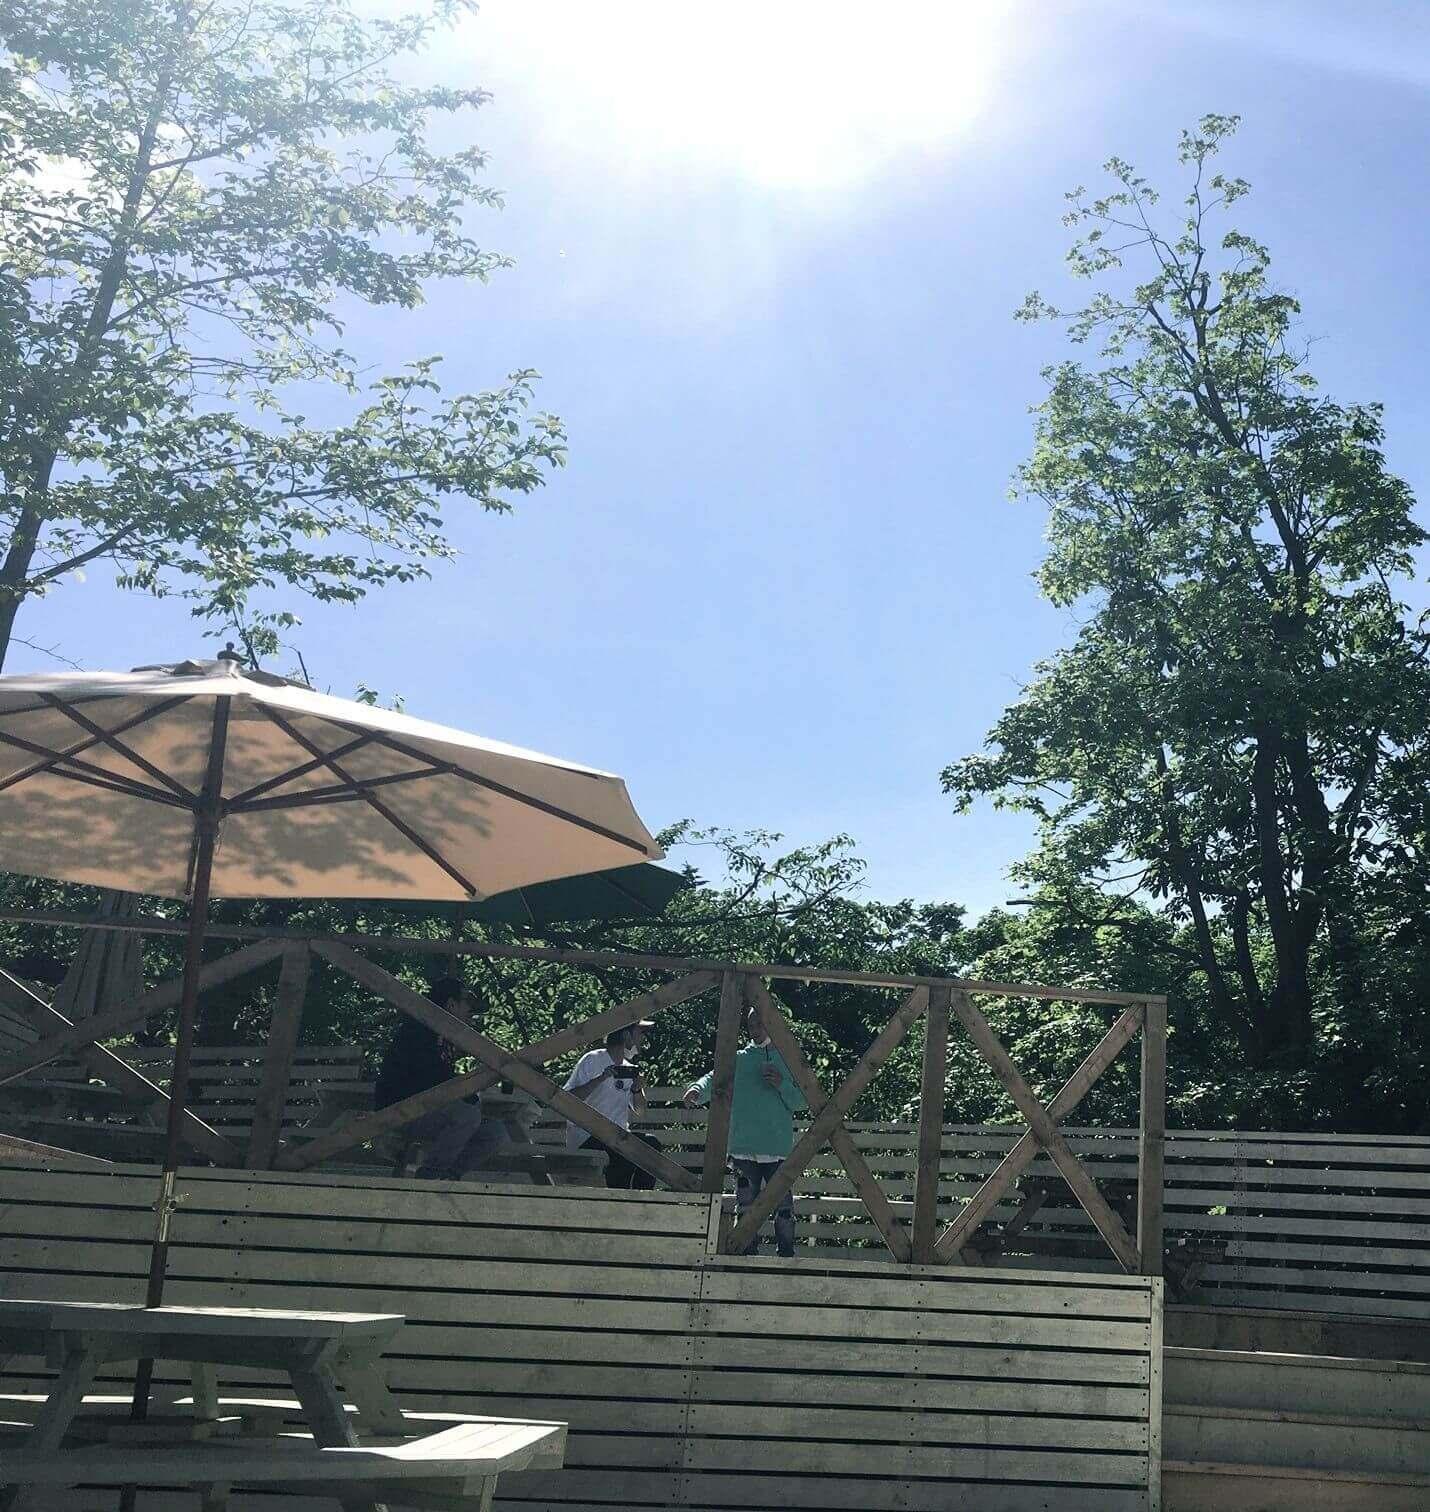 CAFE De CLAMP(カフェ ド クランプ)周りの自然